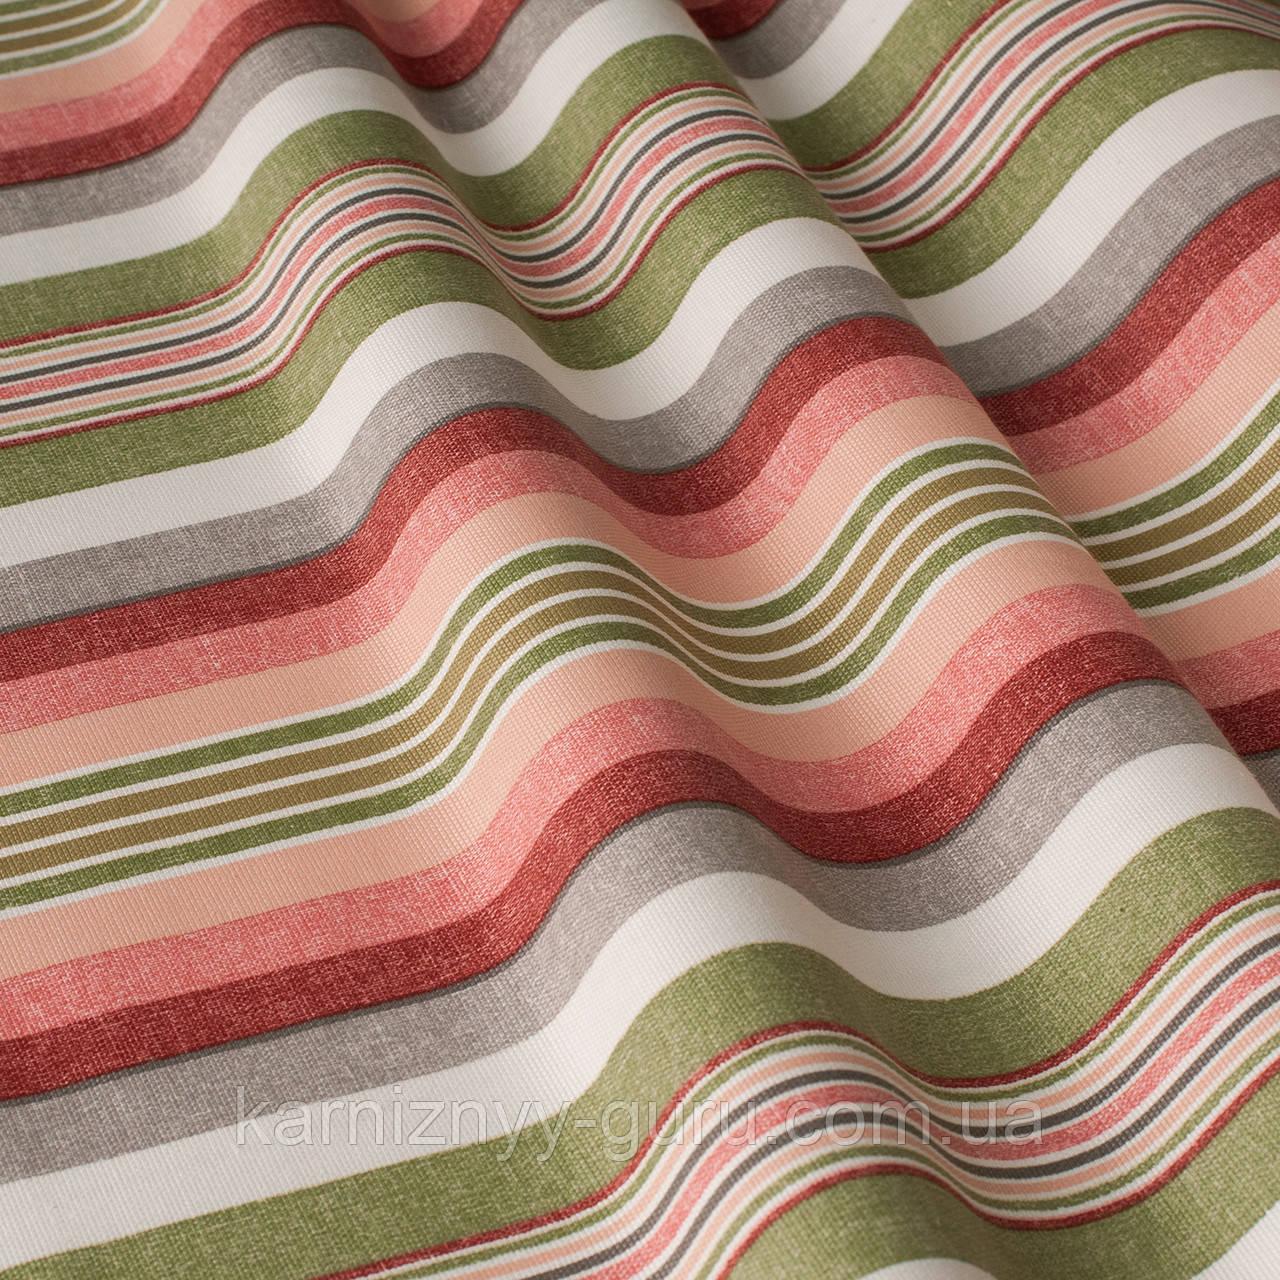 Декоративная ткань в полоску розово-зеленого цвета 180 см 84610v6